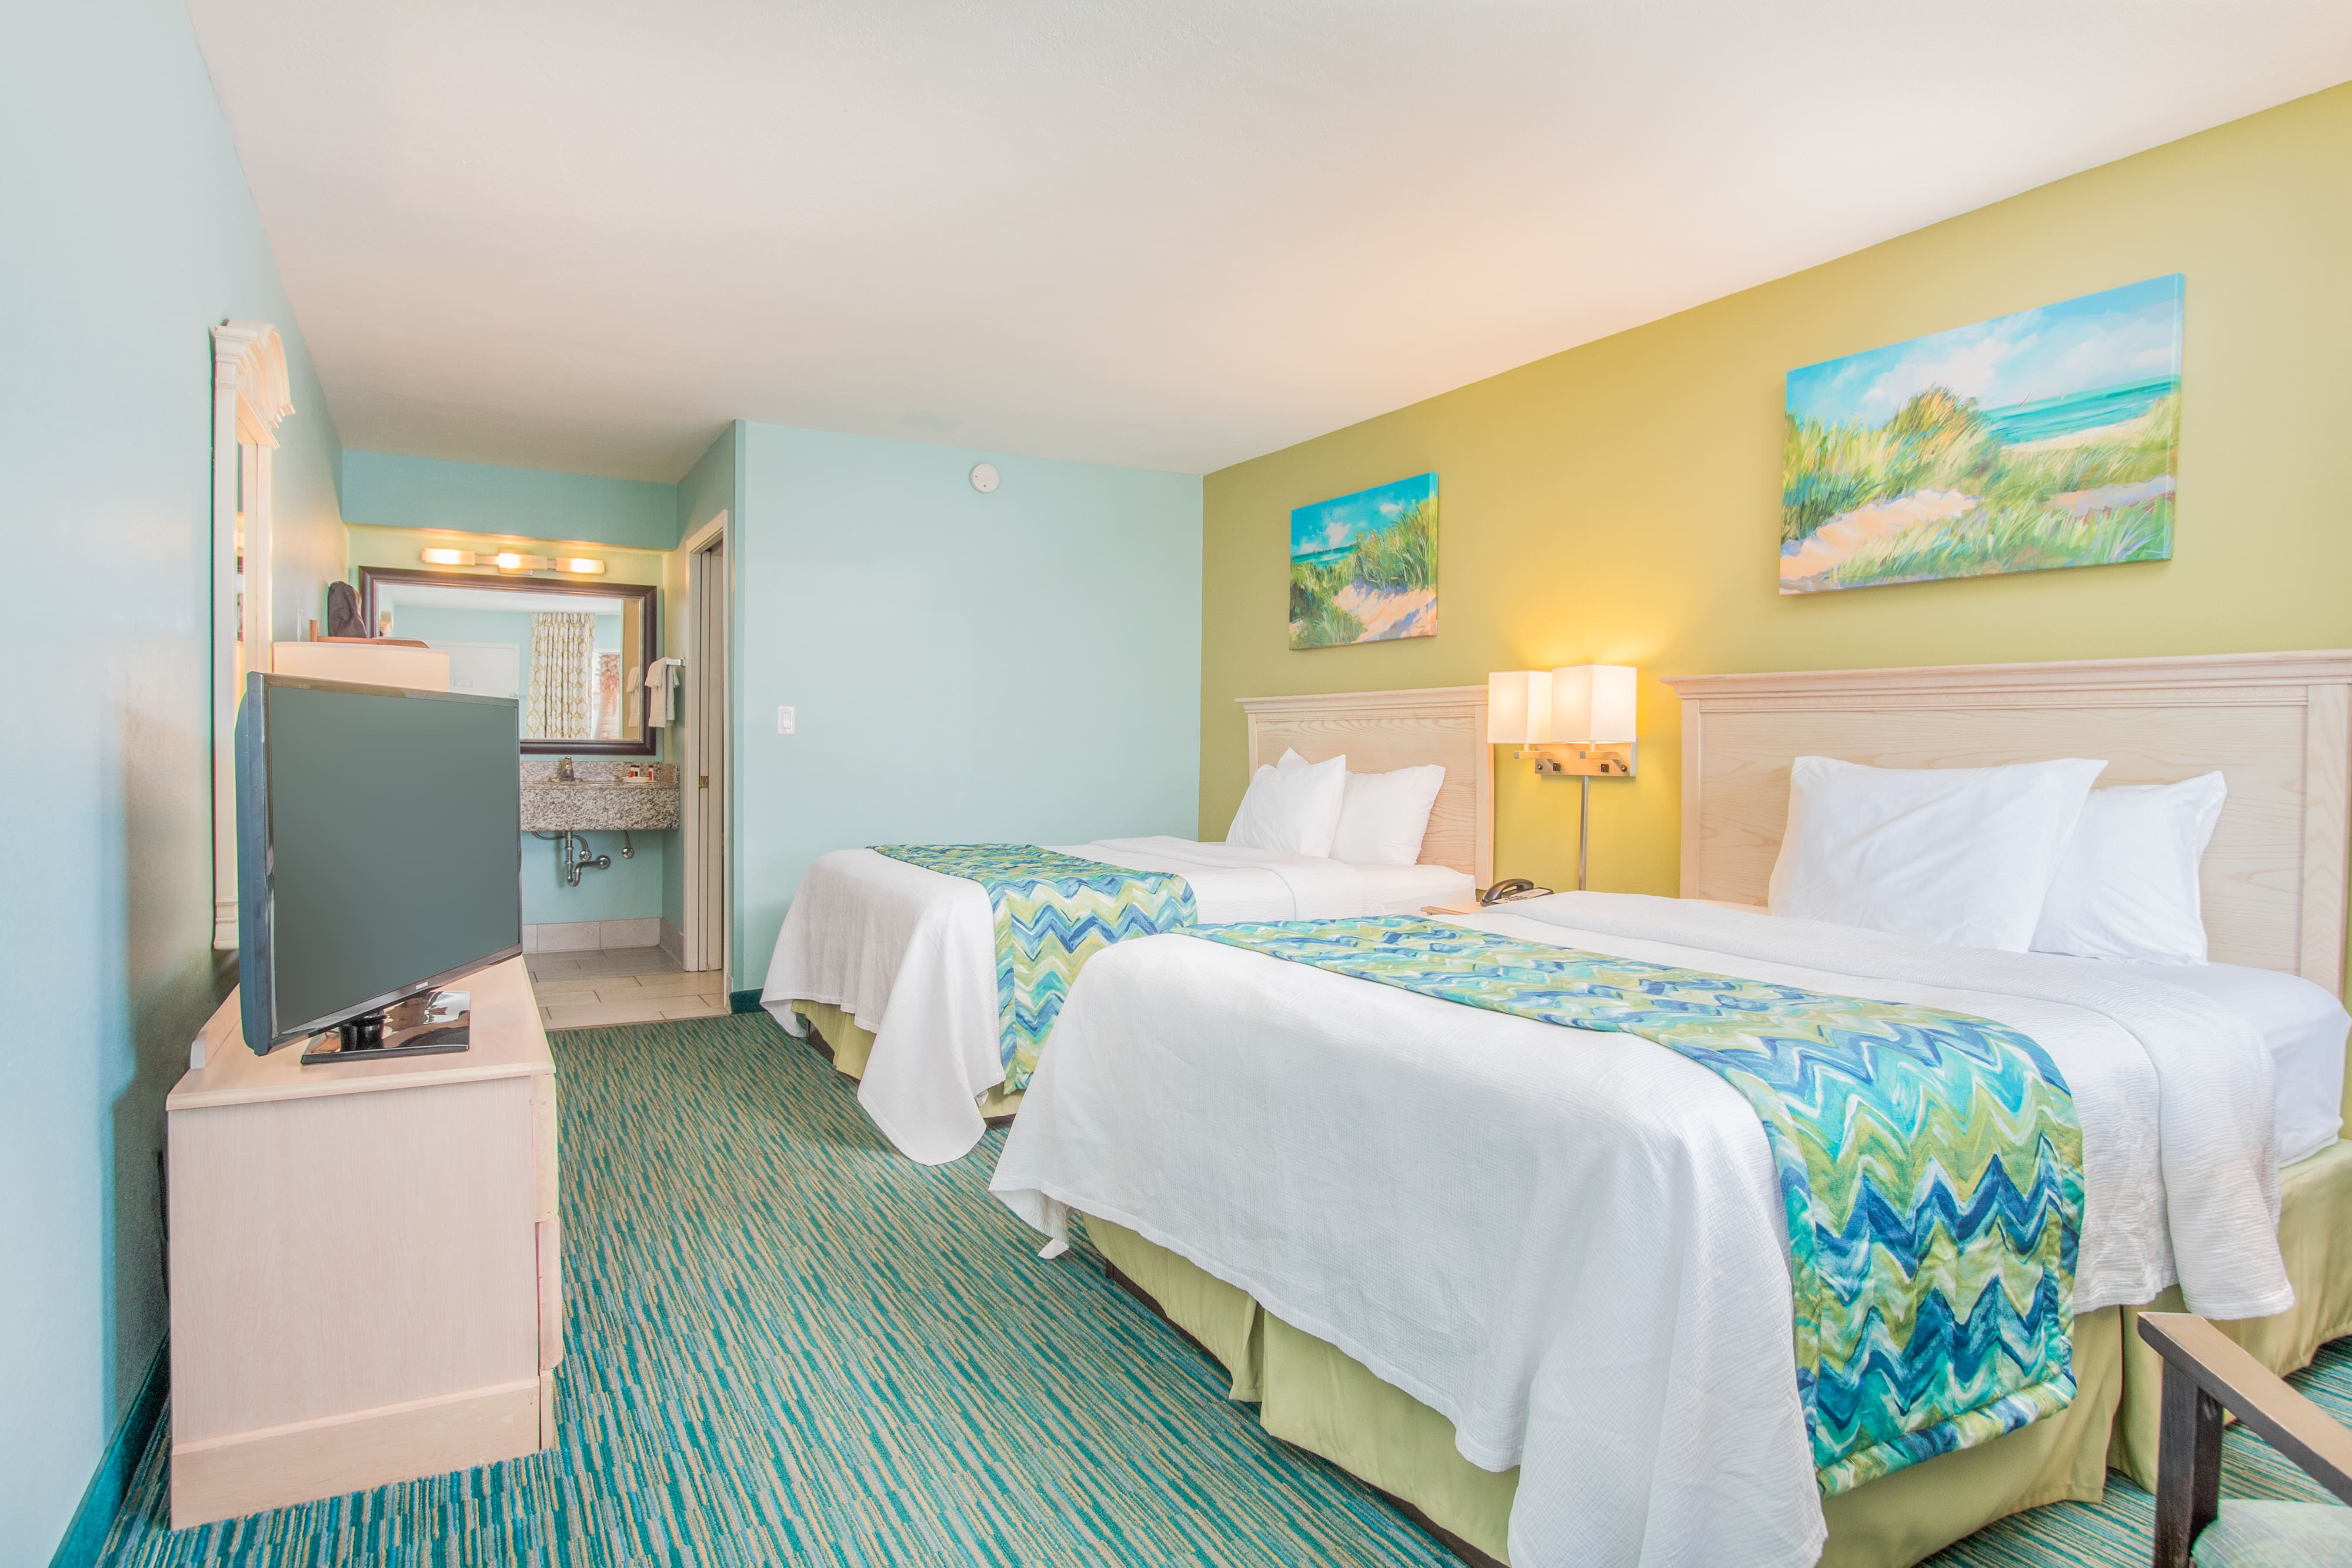 Guest room at the Days Inn Pensacola Beachfront in Pensacola Beach, Florida